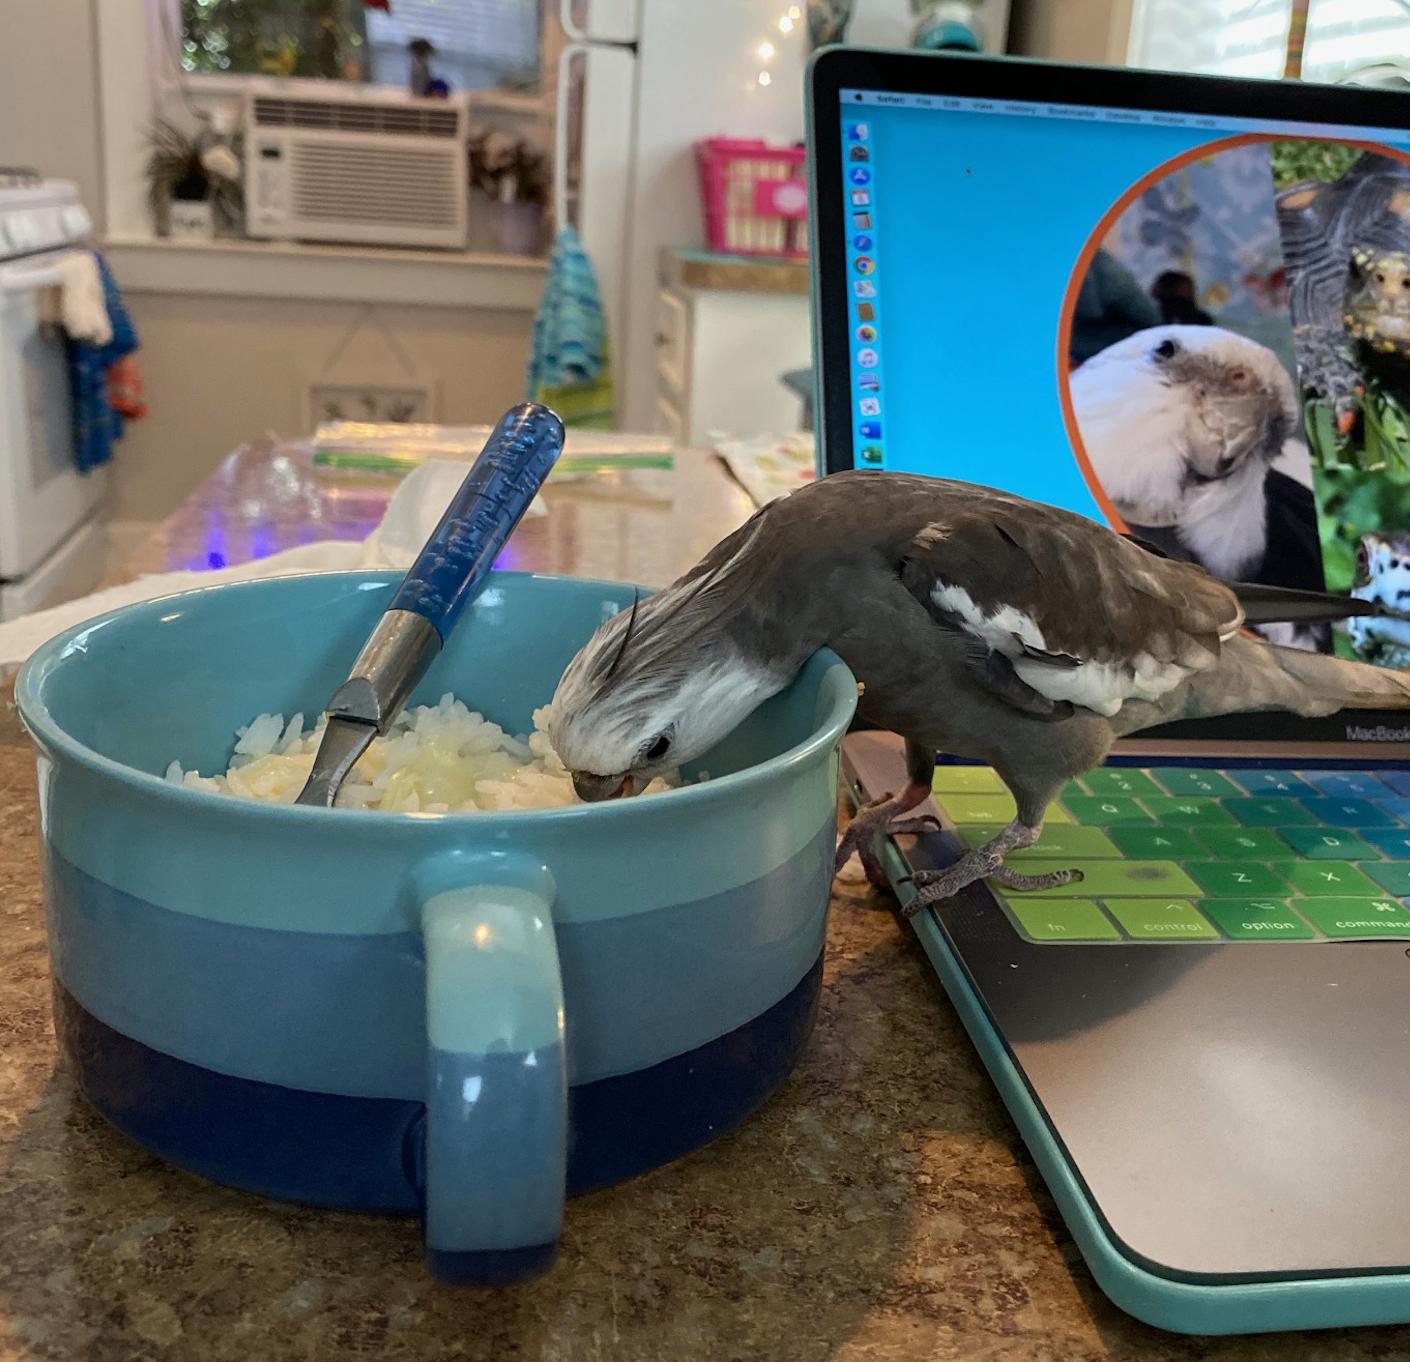 cockatiel stands on laptop